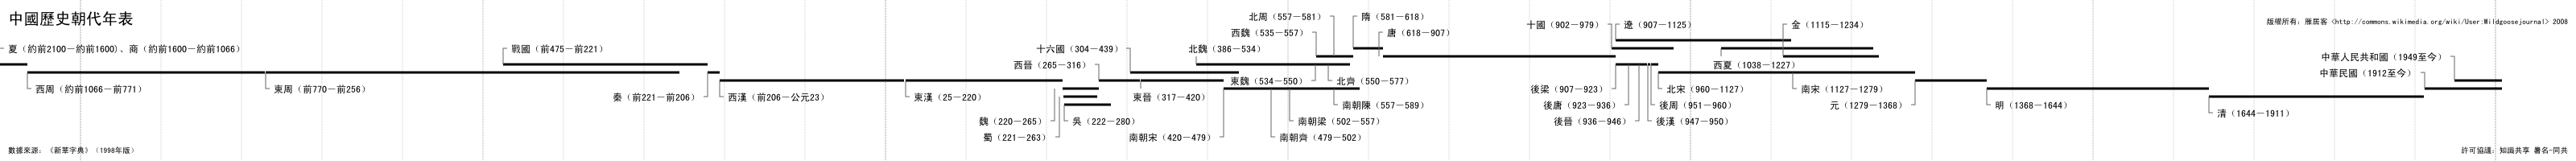 ����Ŵ��й���ʷ������� Chinese dynasties timeline